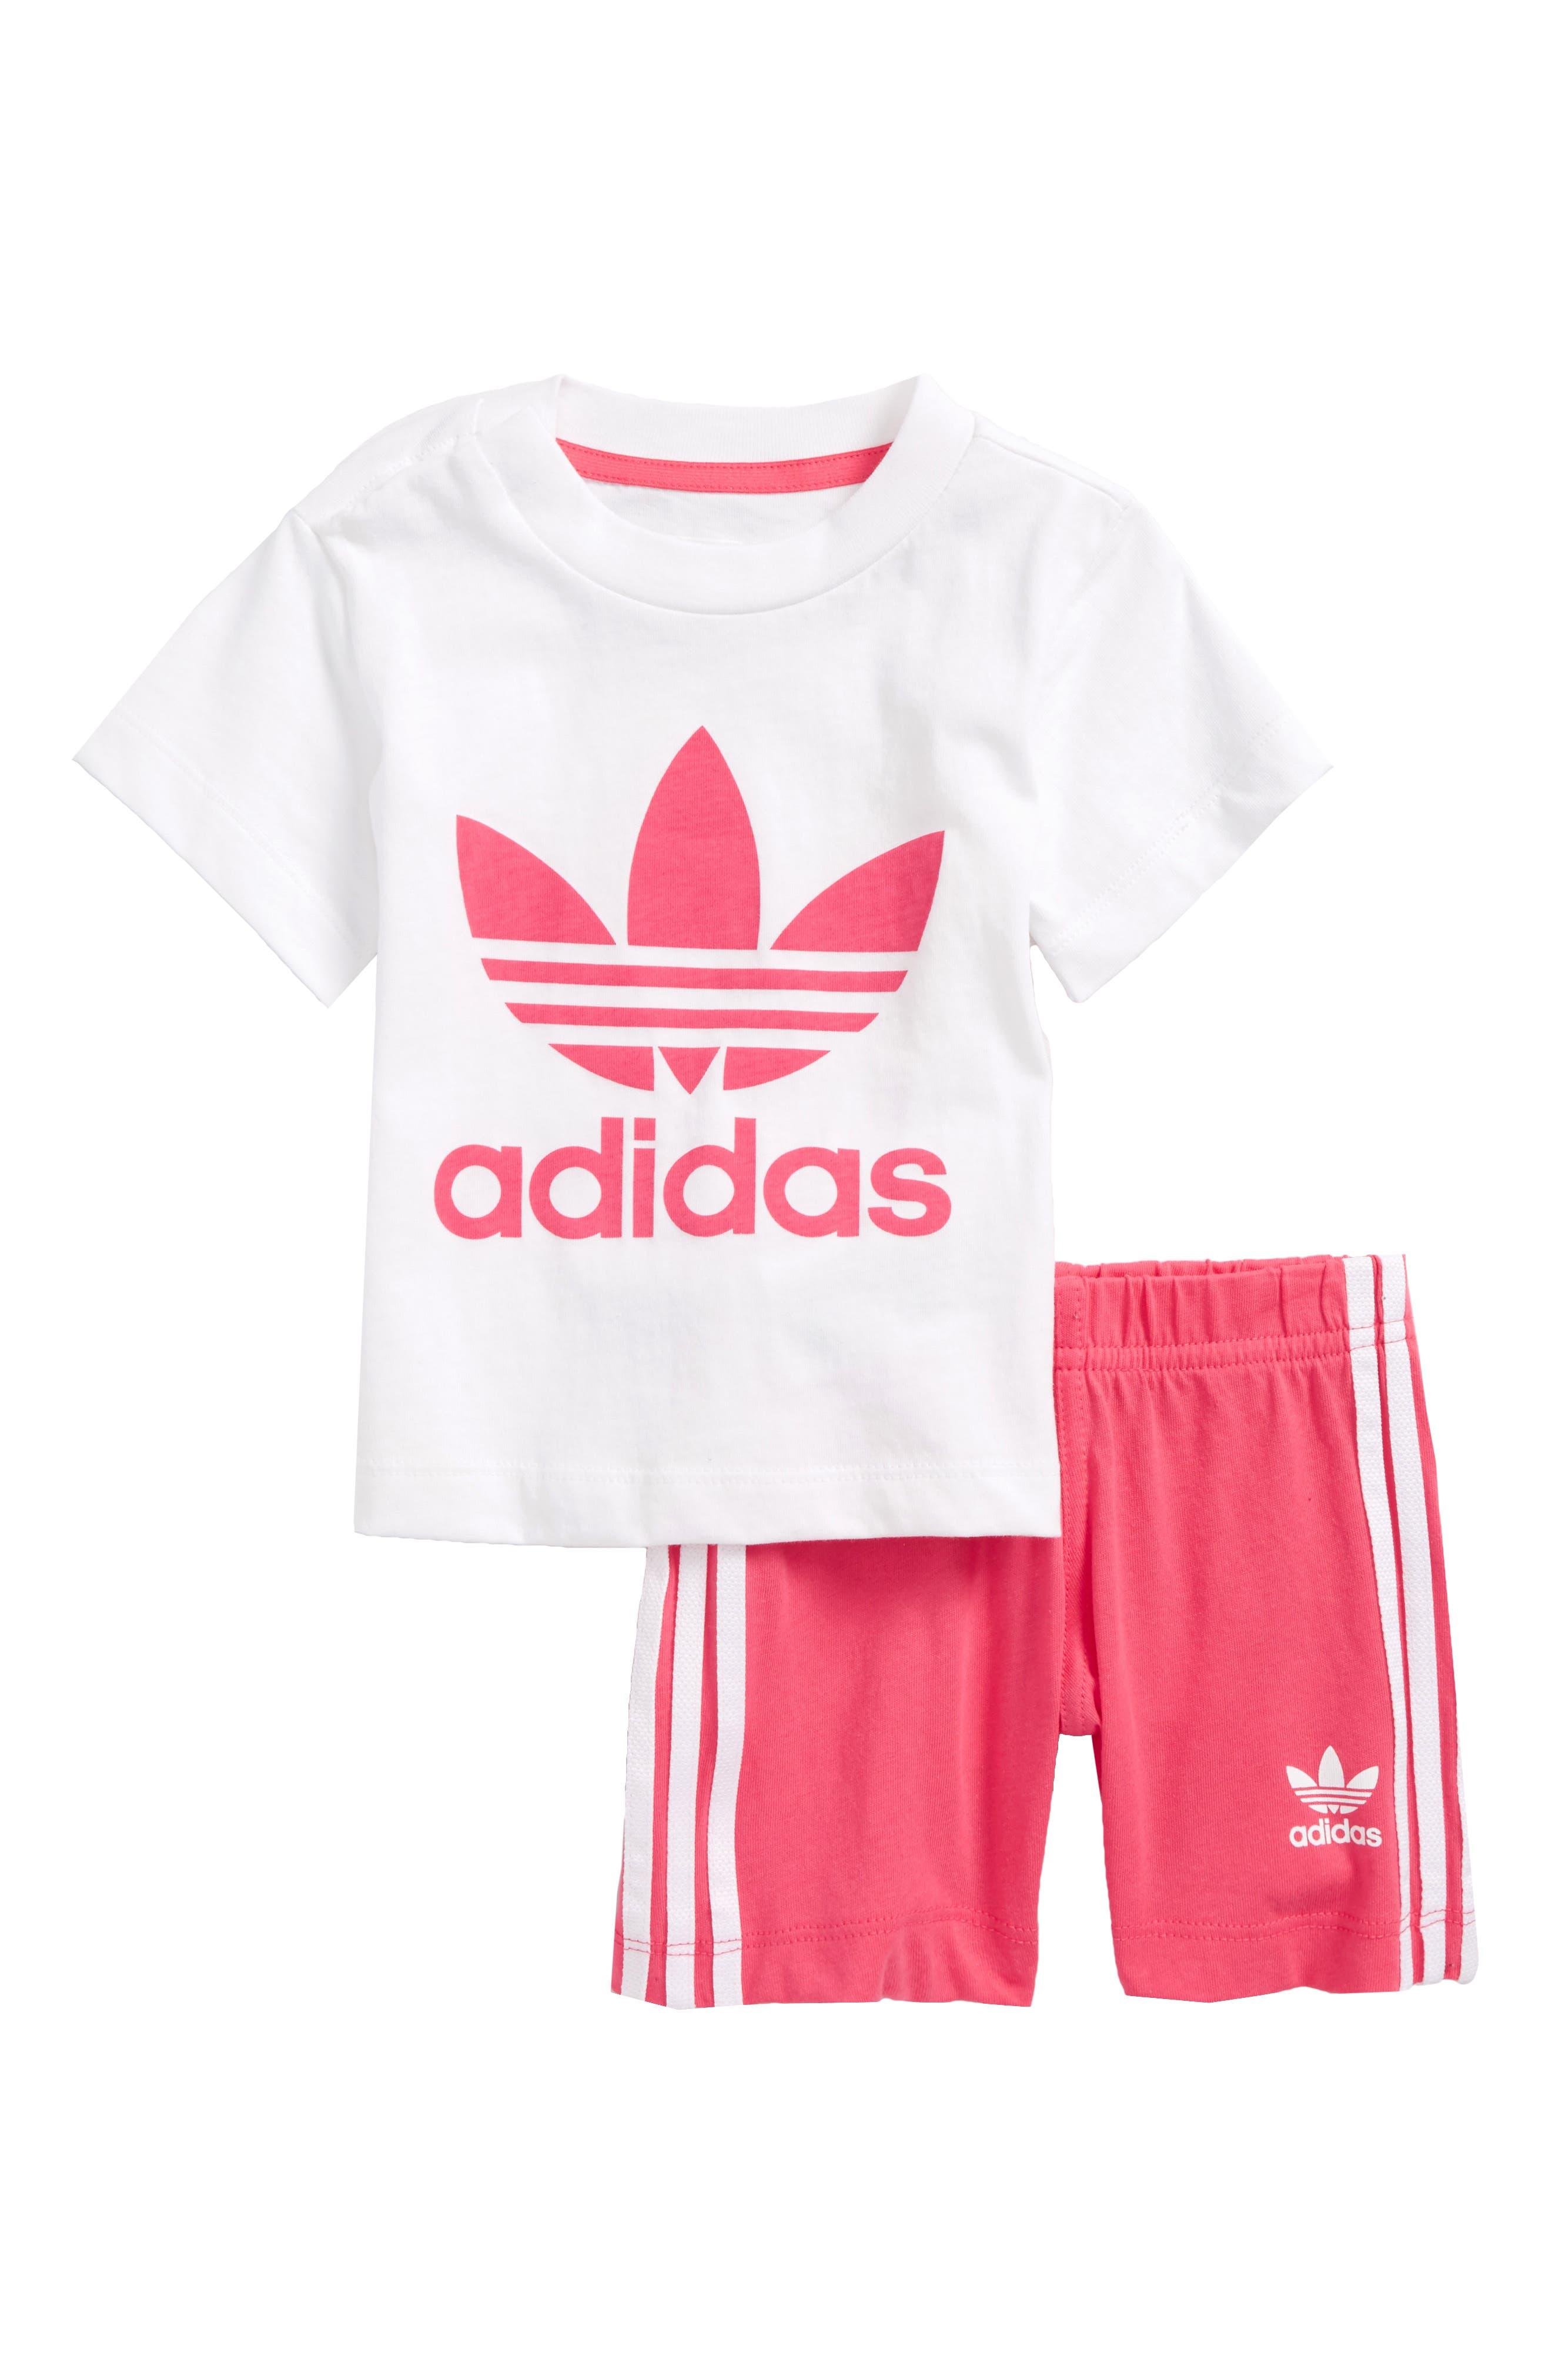 Originals Graphic Tee & Shorts Set,                         Main,                         color, White / Real Pink